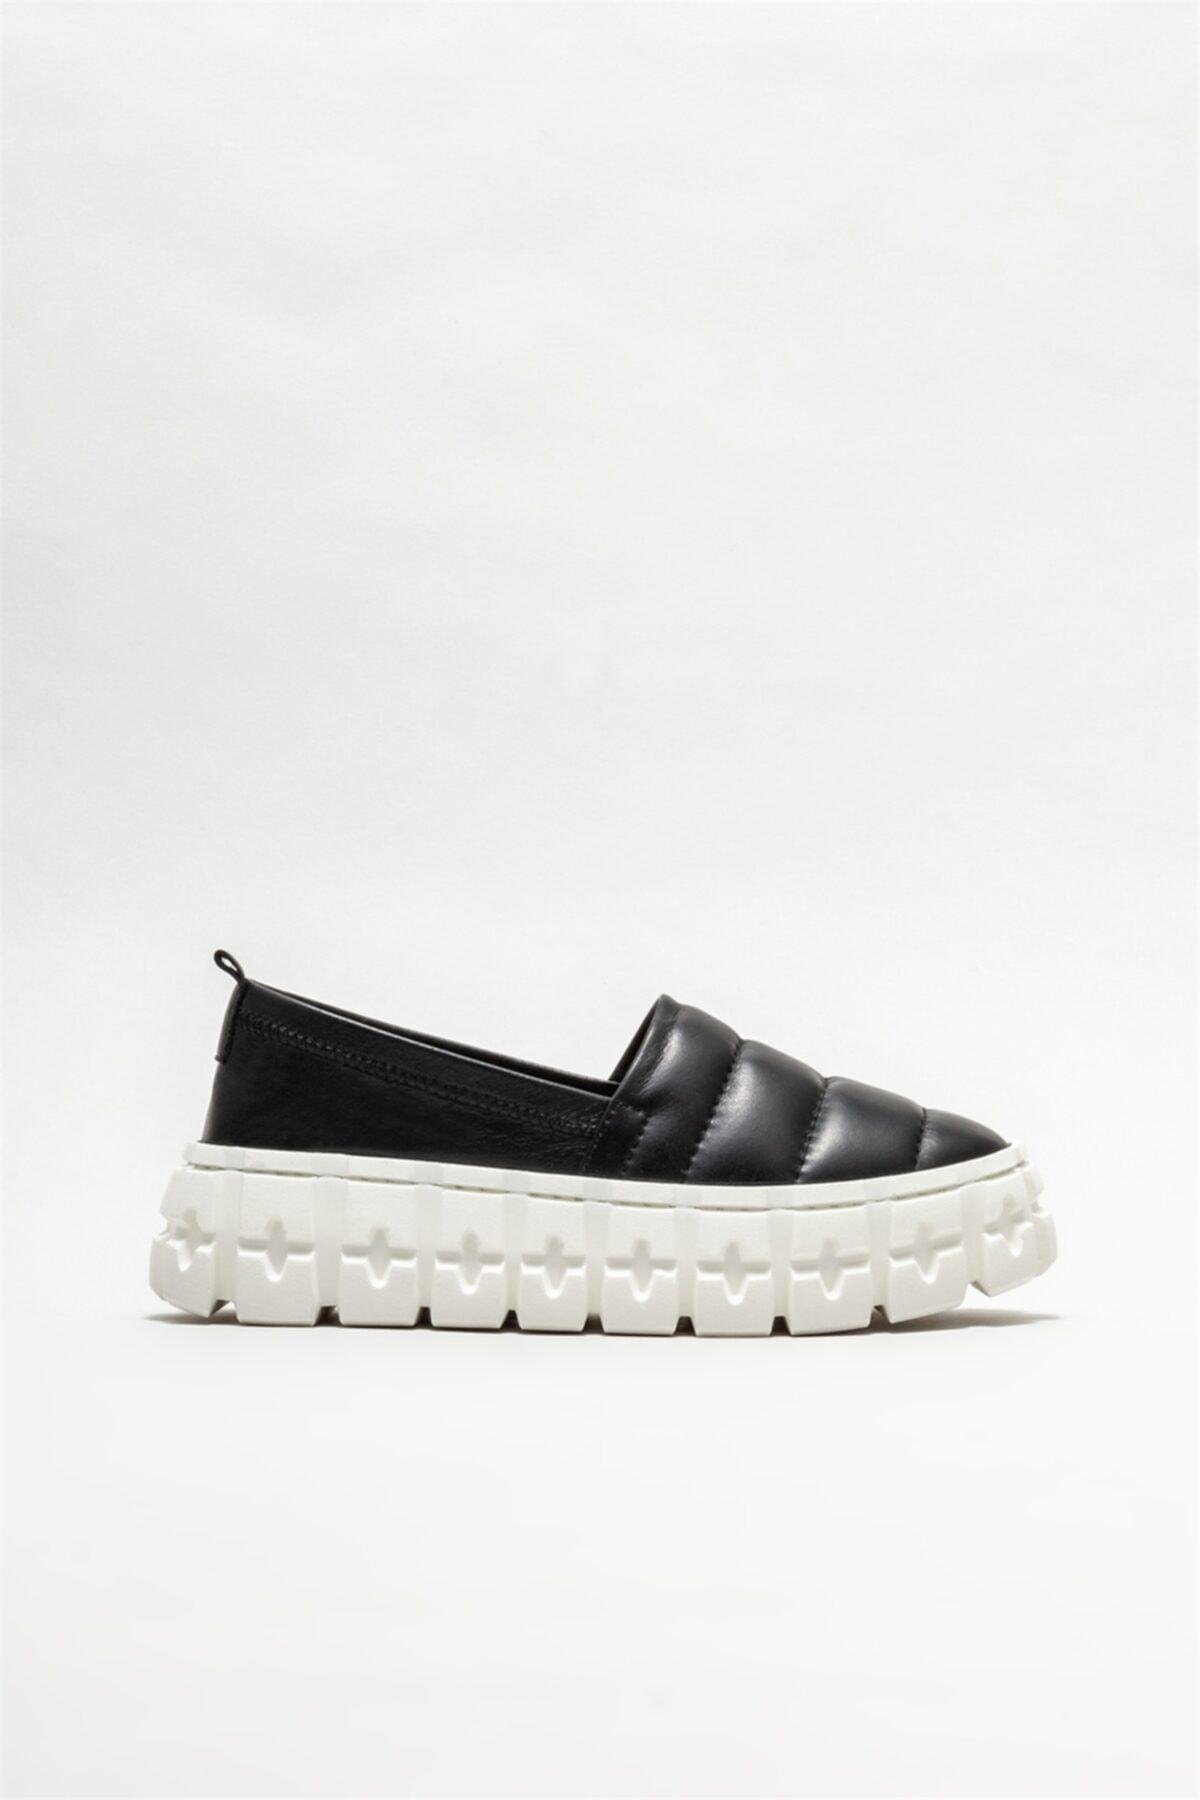 Elle Shoes Kadın Siyah Deri Sneaker 1